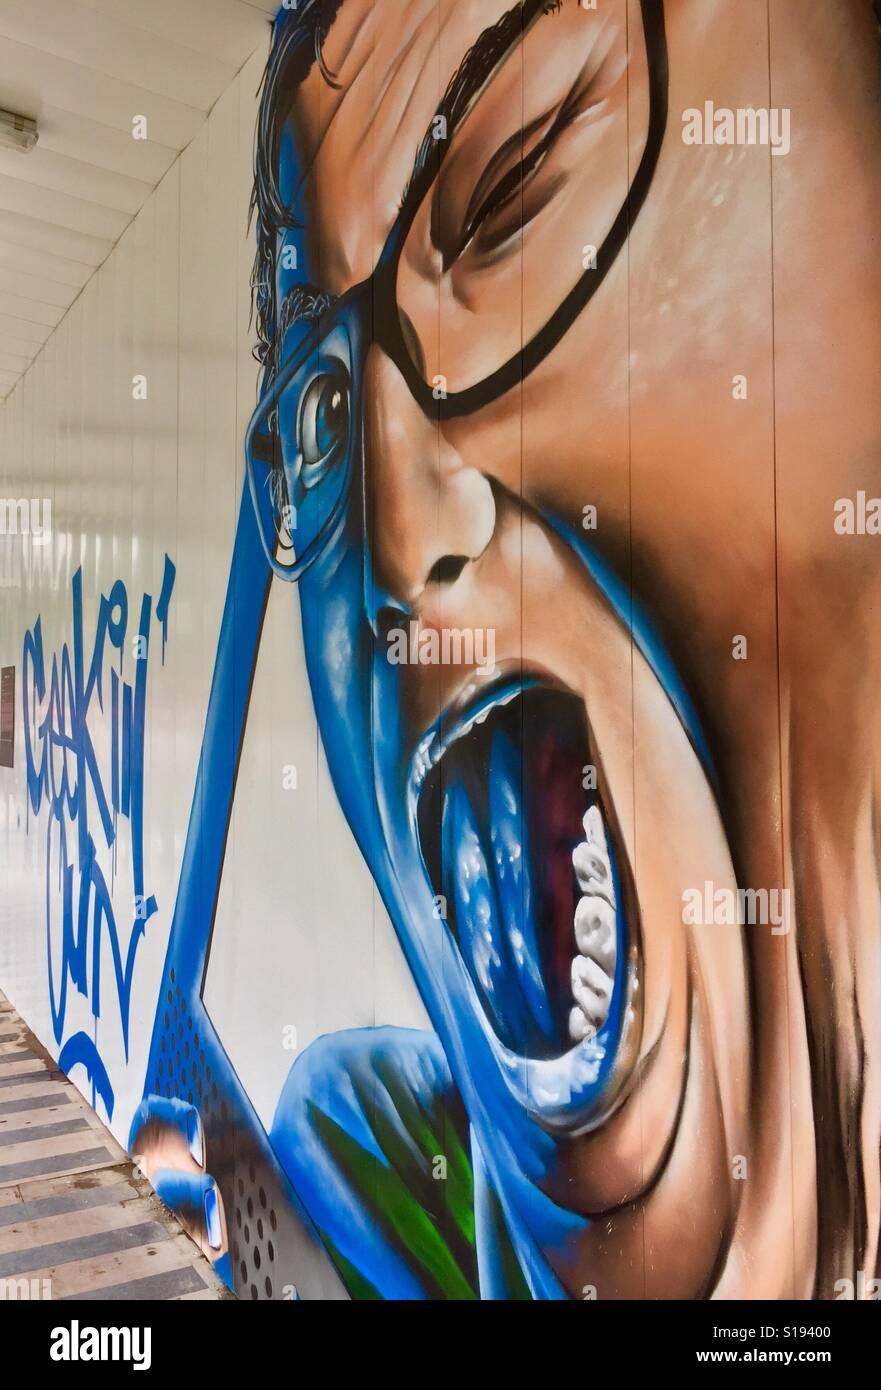 Mural Painting By Graffiti Artist Ceno2 Singapore Stock Photo